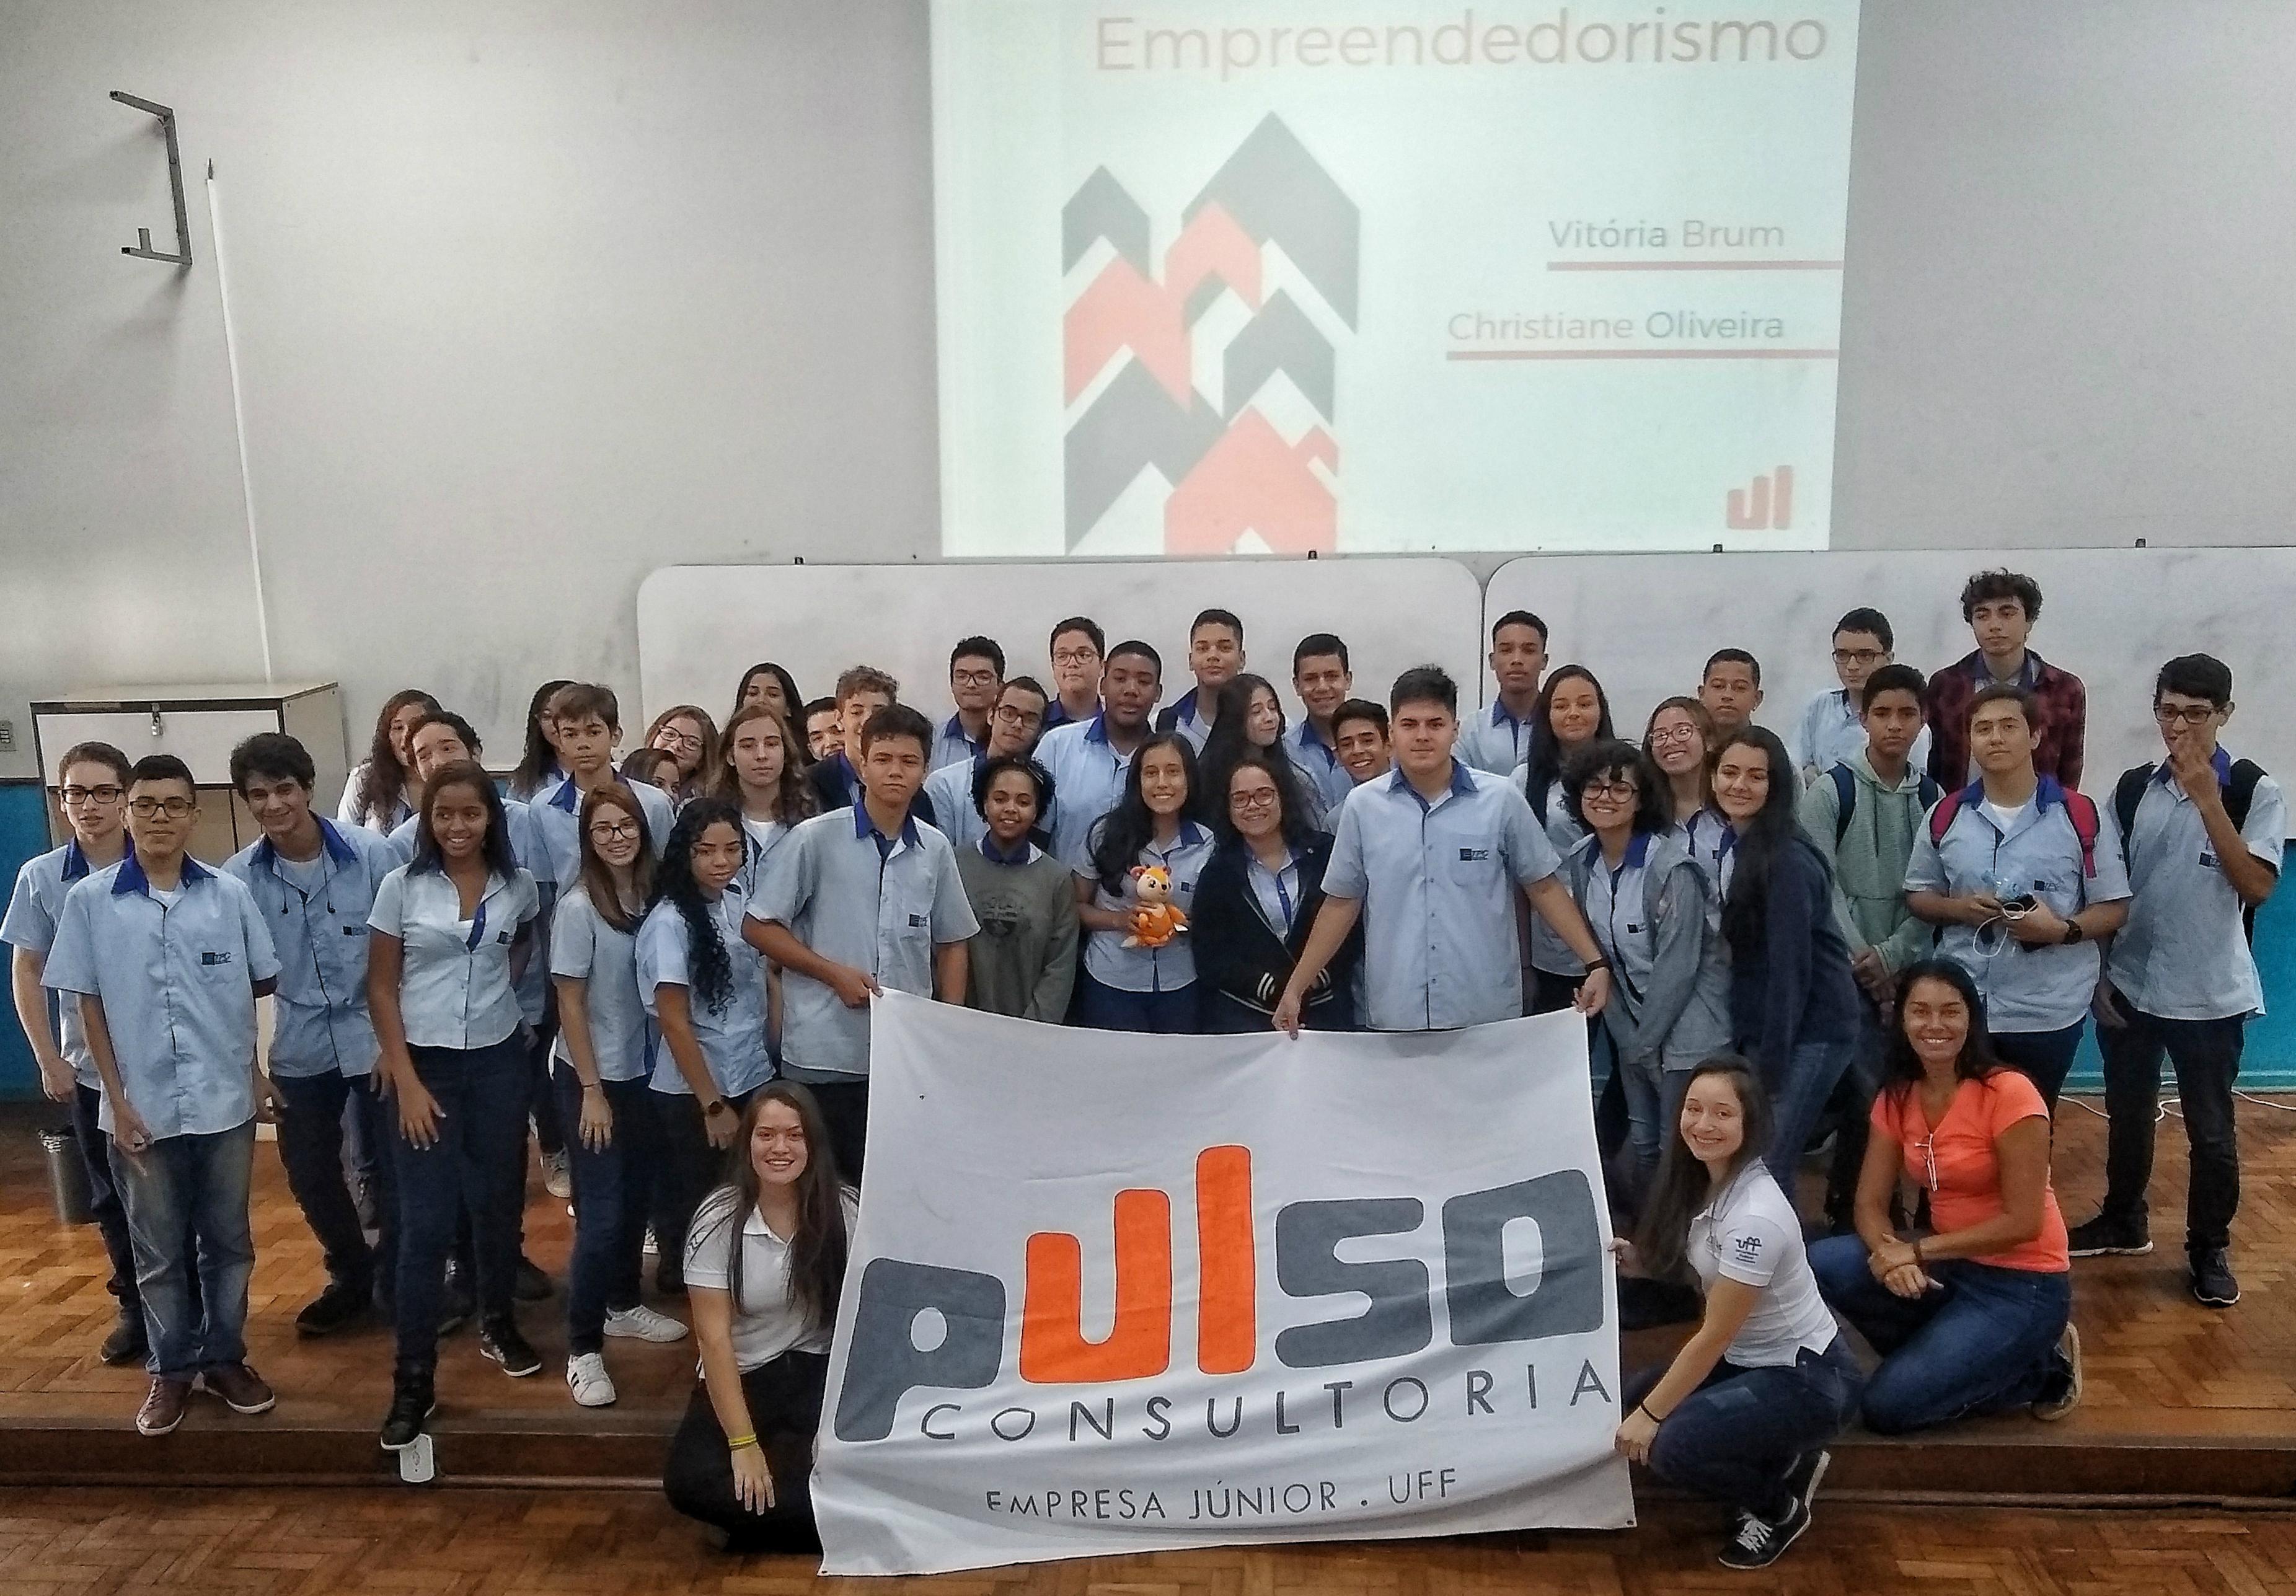 Palestra da Pulse sobre empreendedorismo